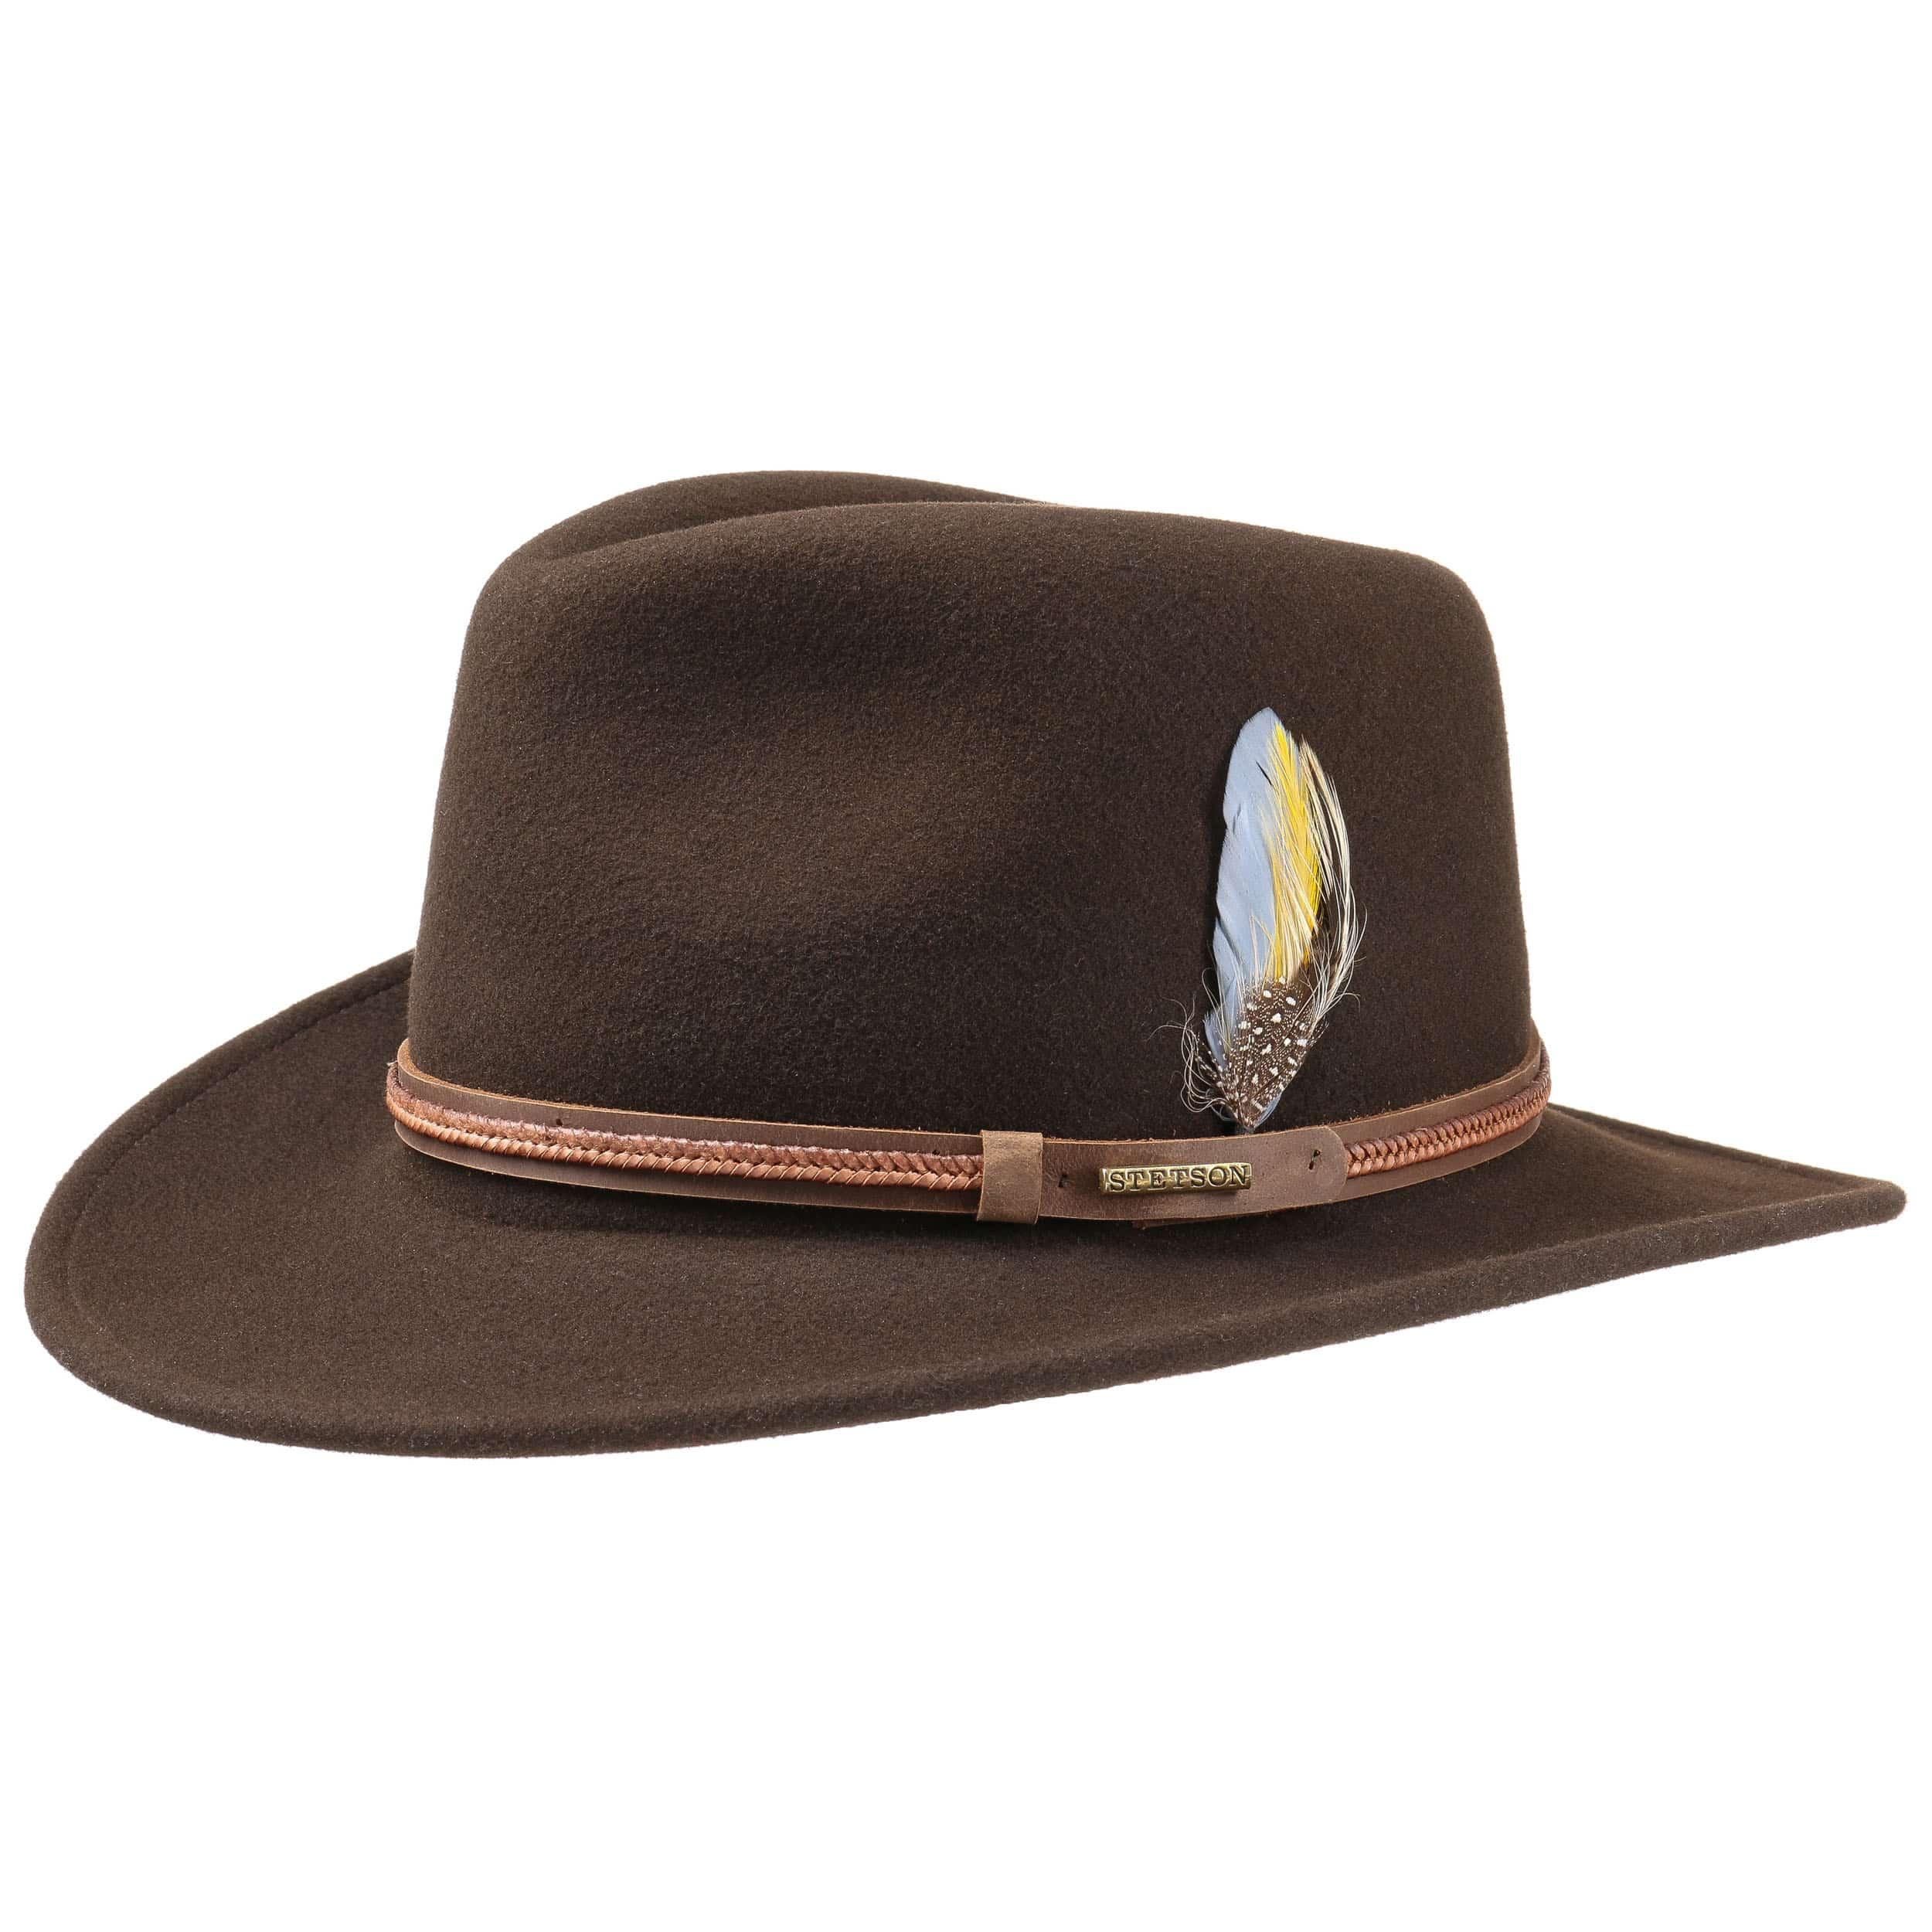 7f30064b ... Chatham VitaFelt Hat by Stetson - brown 4 ...